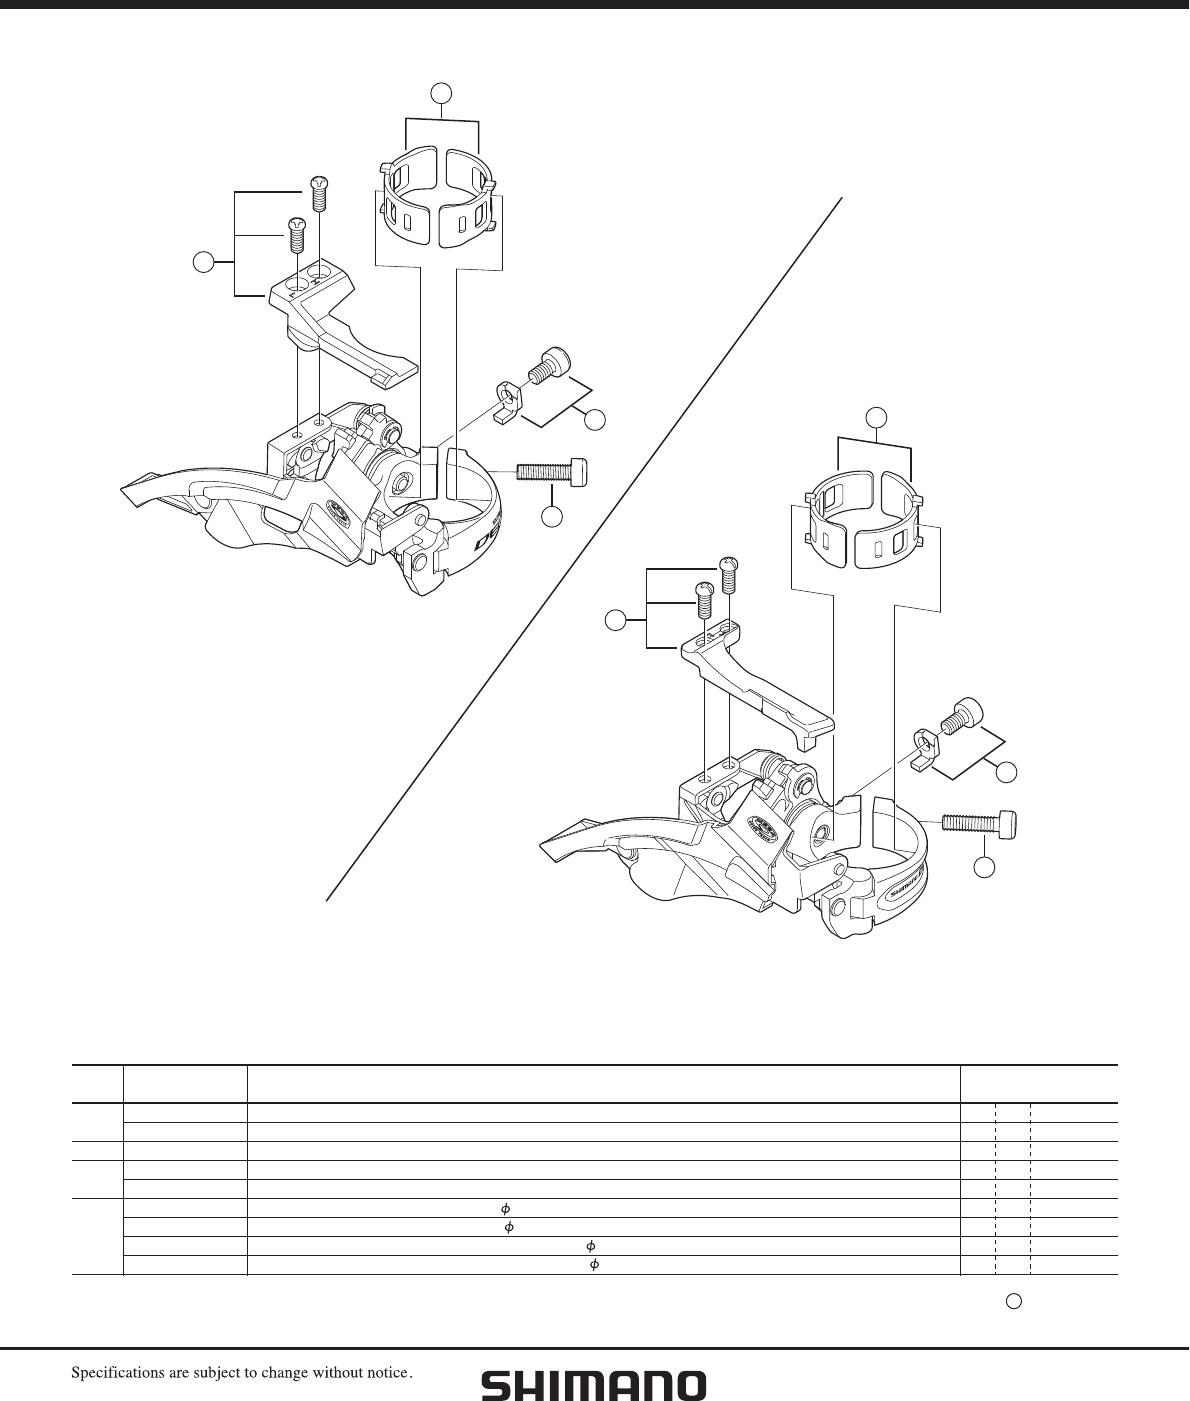 Shimano Repair Manual Isuzu 4he1 Engine Diagram Array Deore M590 Front Derailleur User Rh Usermanual Wiki